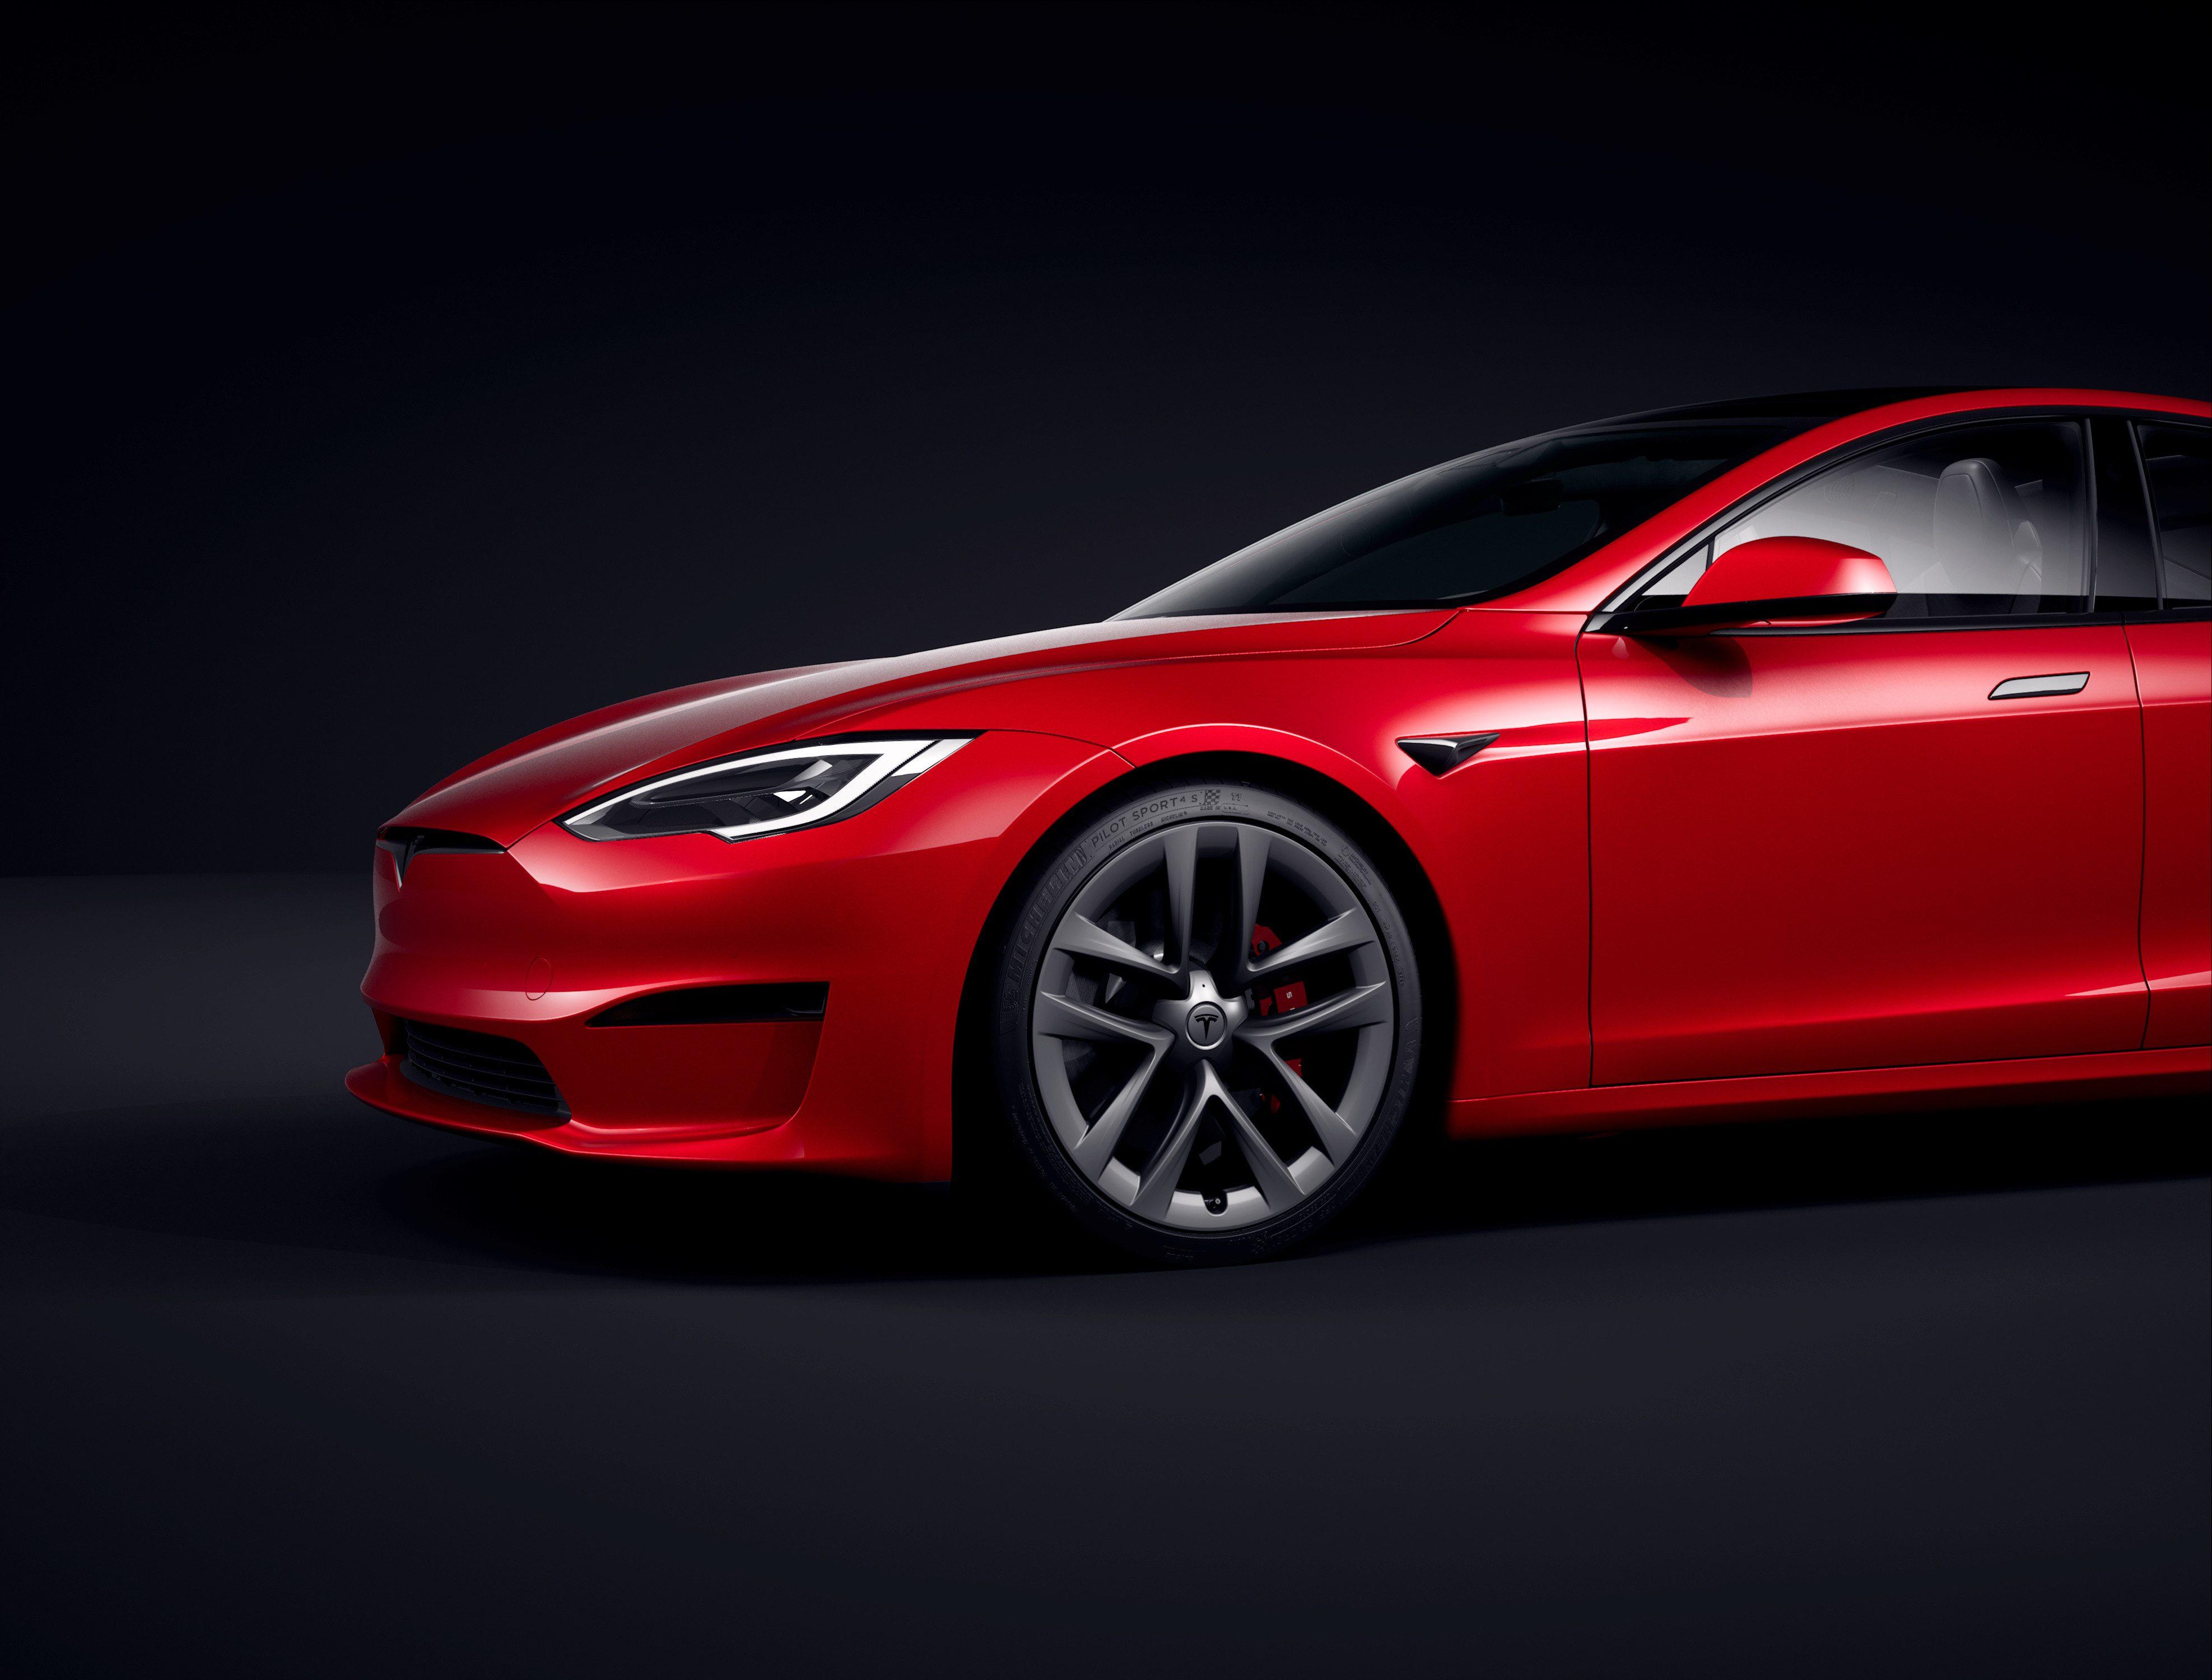 Tesla Stock Price Prediction for the next few days